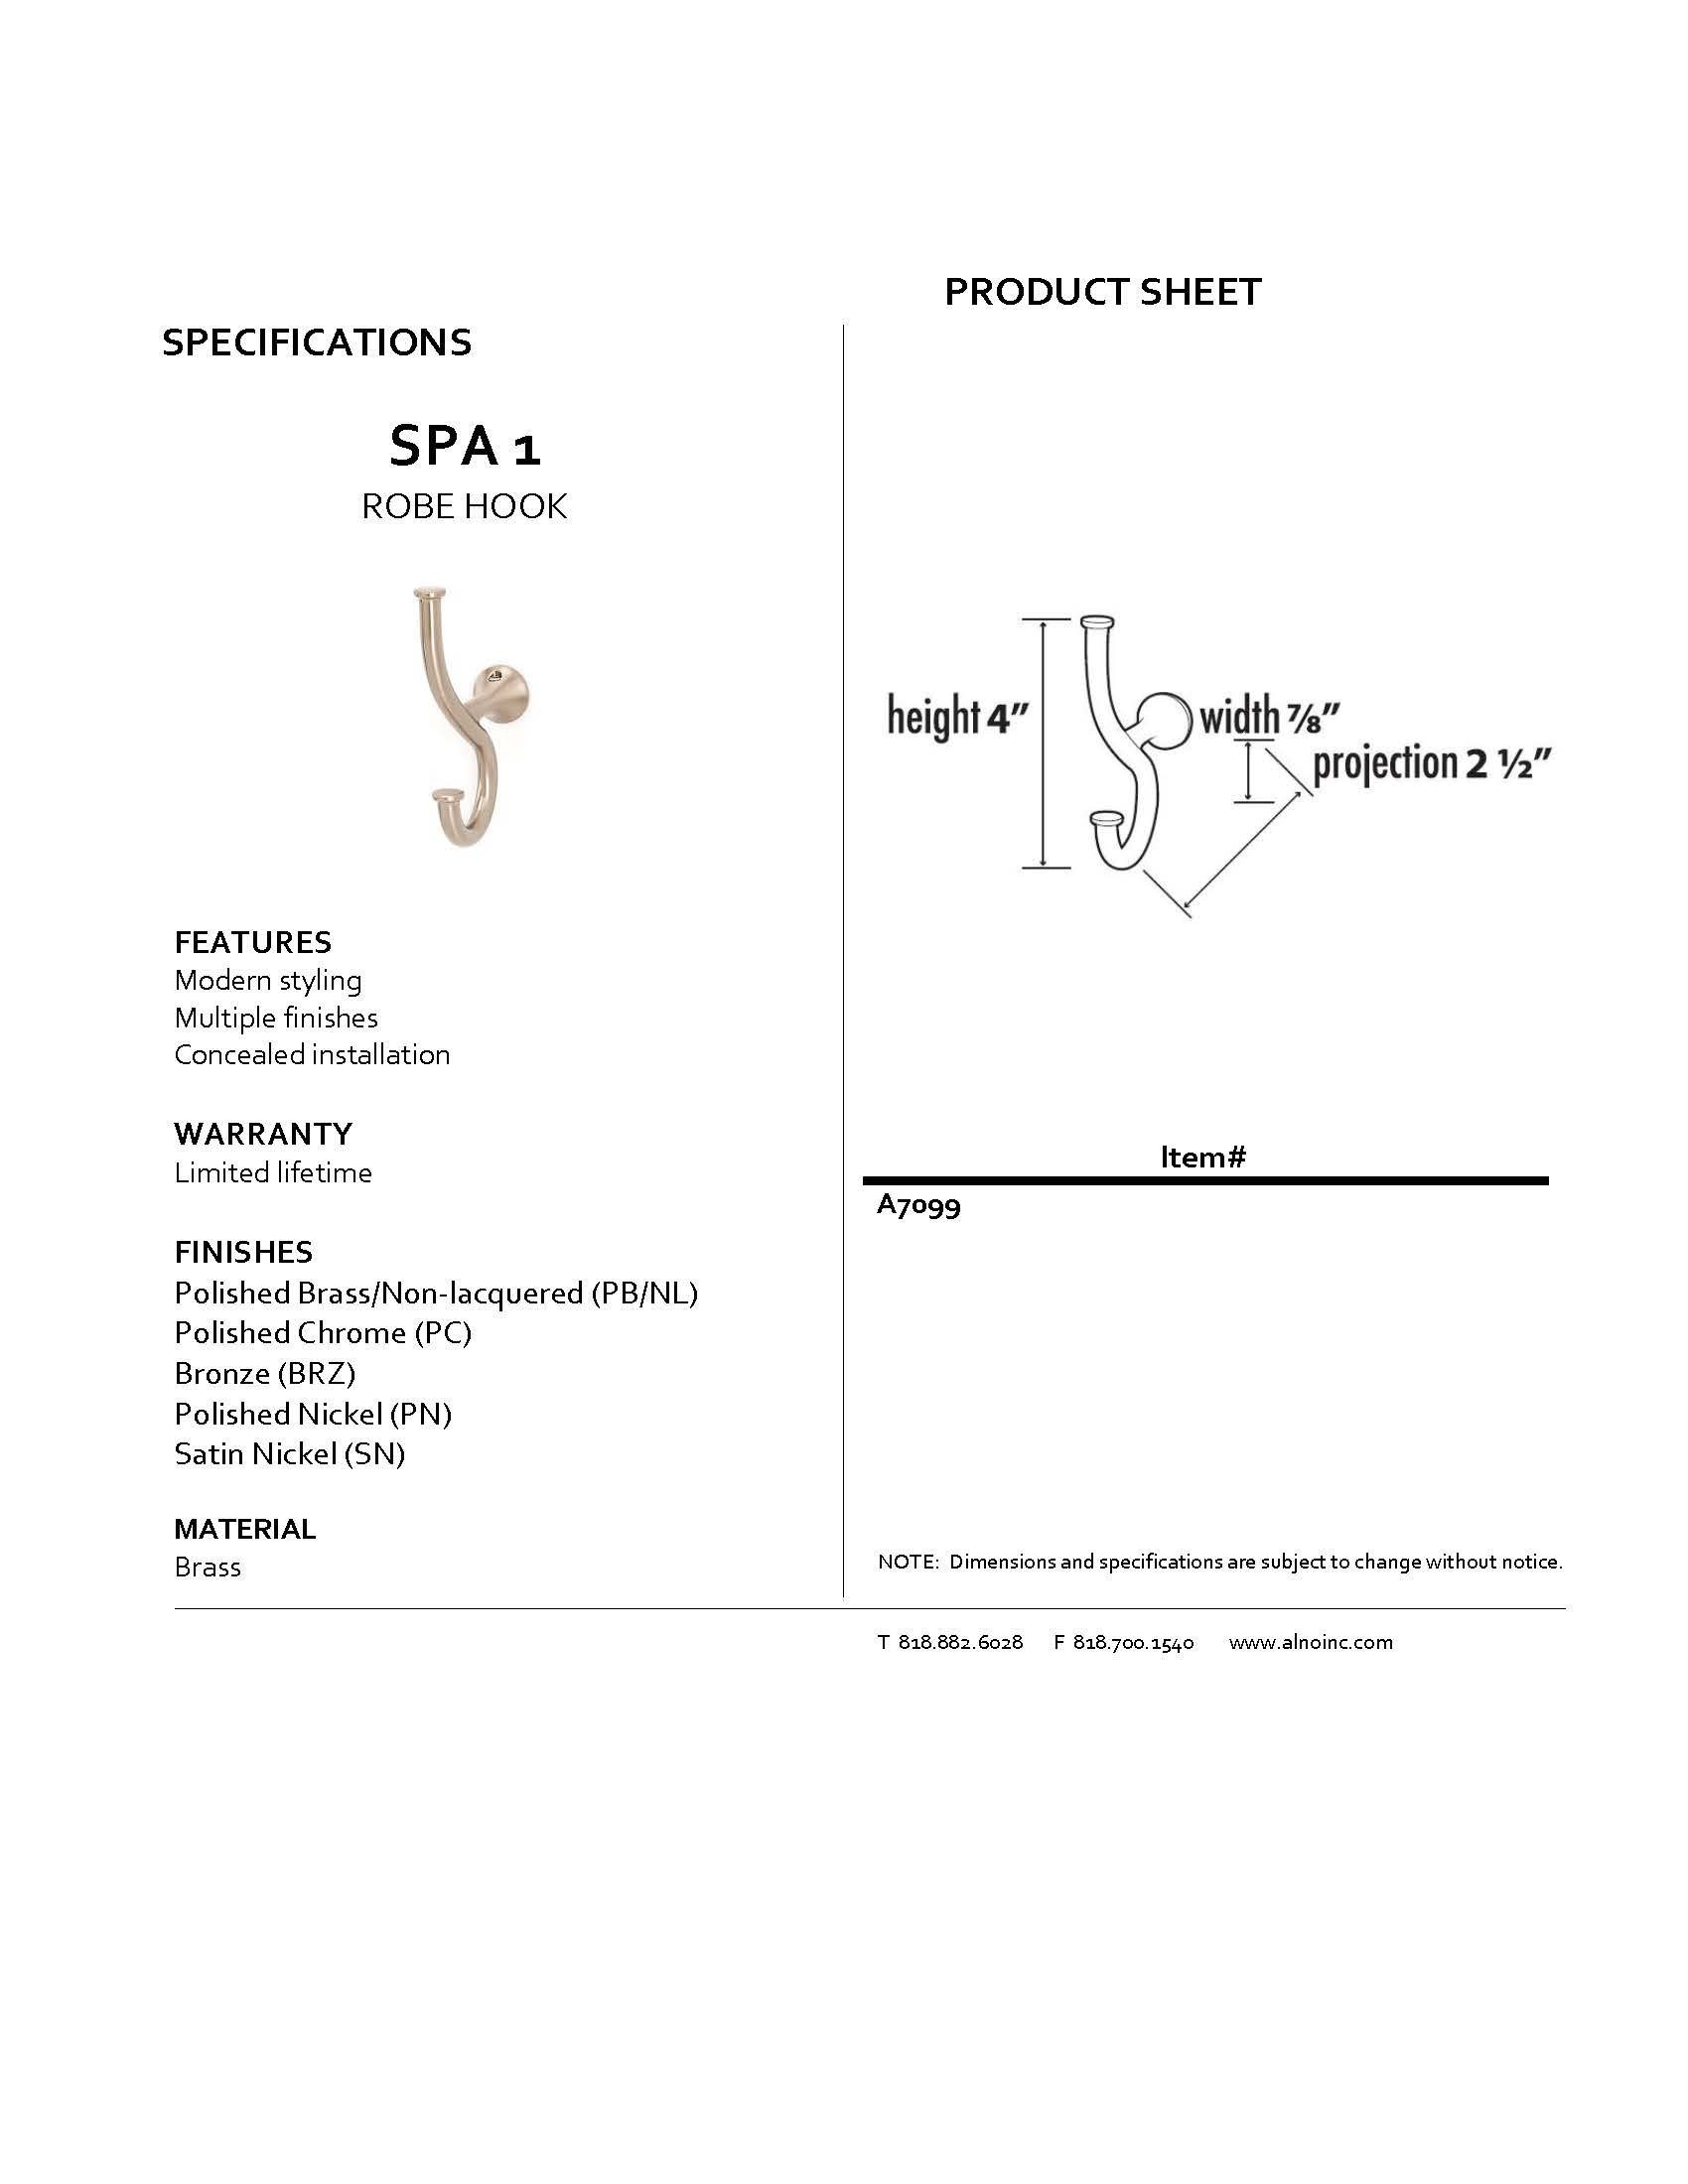 Alno A7099-SN Spa 1 Modern Robe Hooks, Satin Nickel